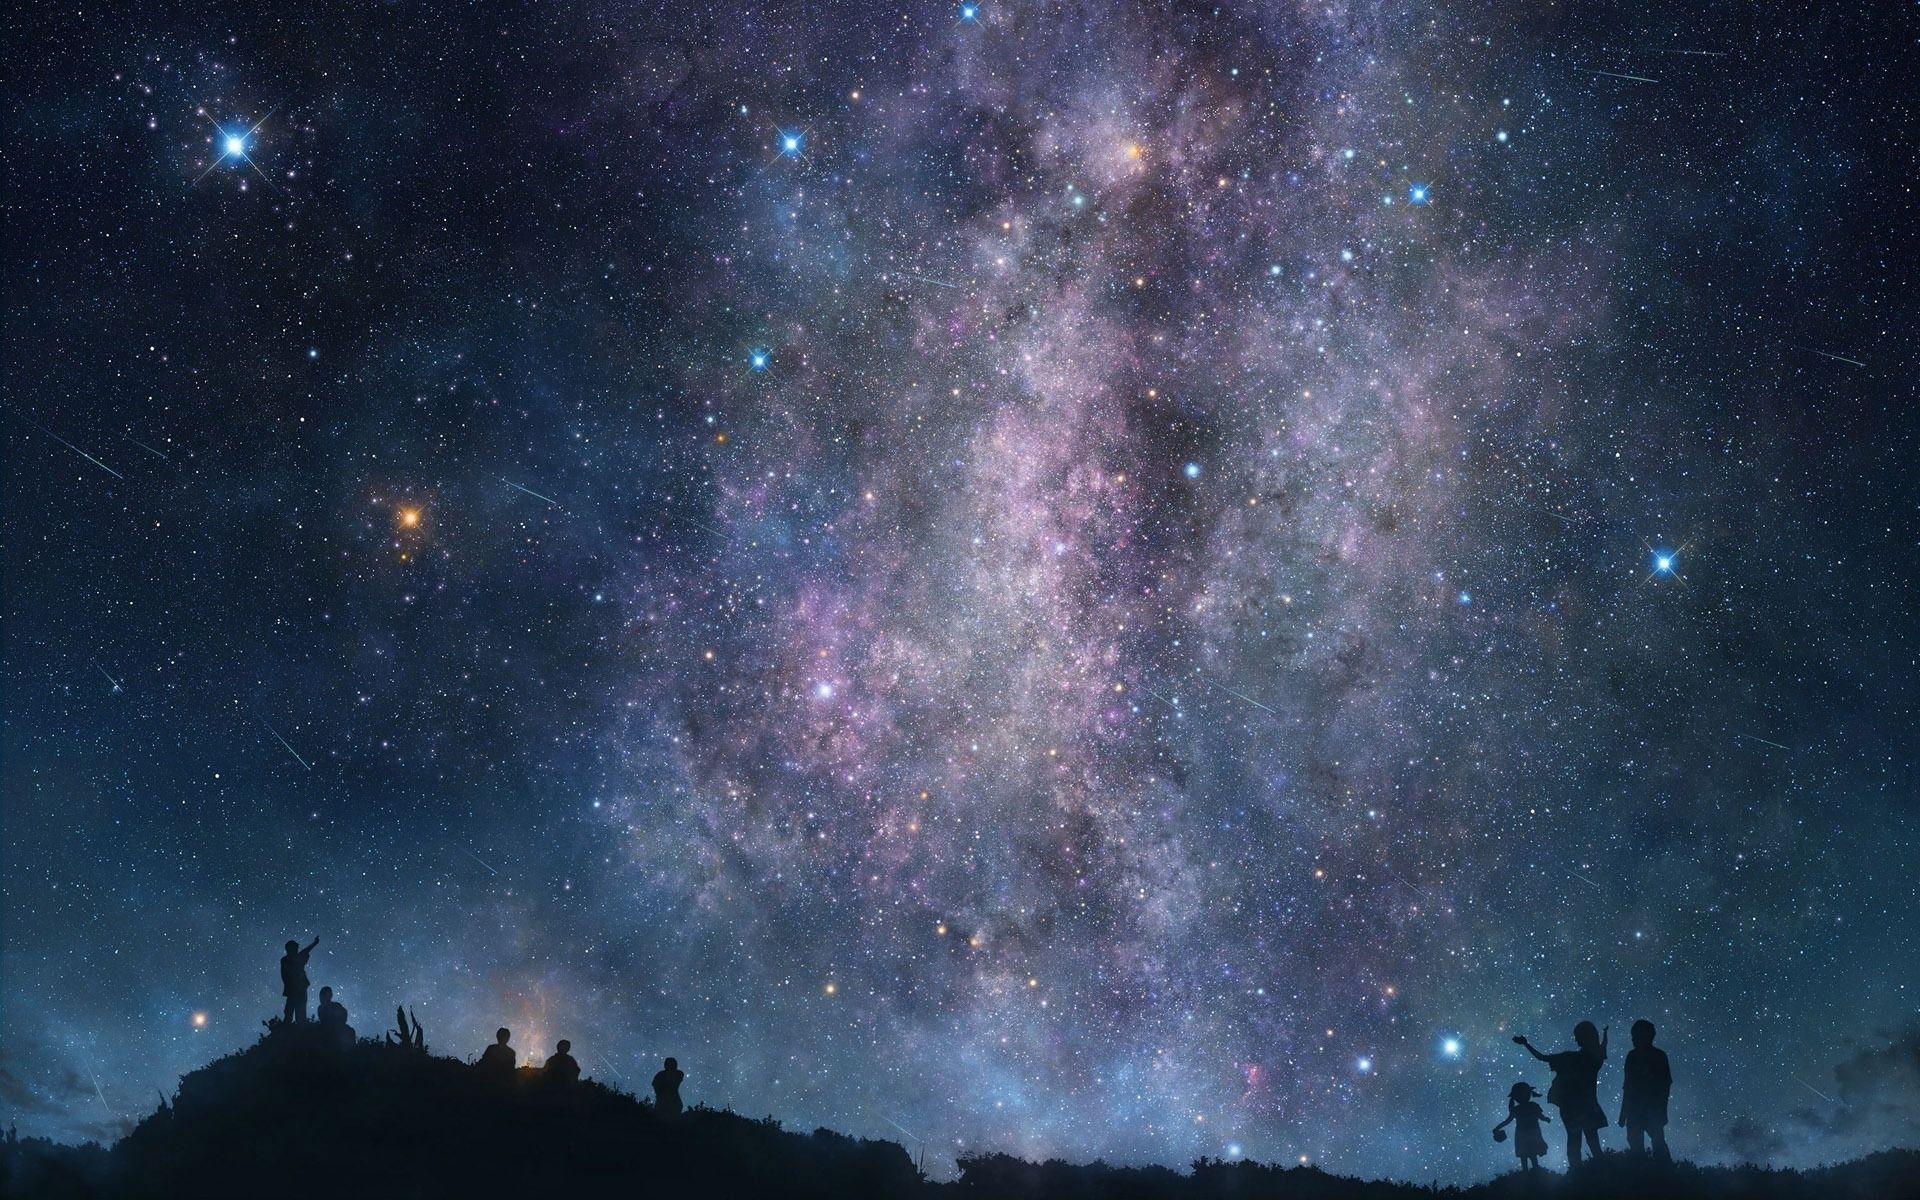 night sky stars wallpaper high definition #jwrat 1920x1200 px 845.91